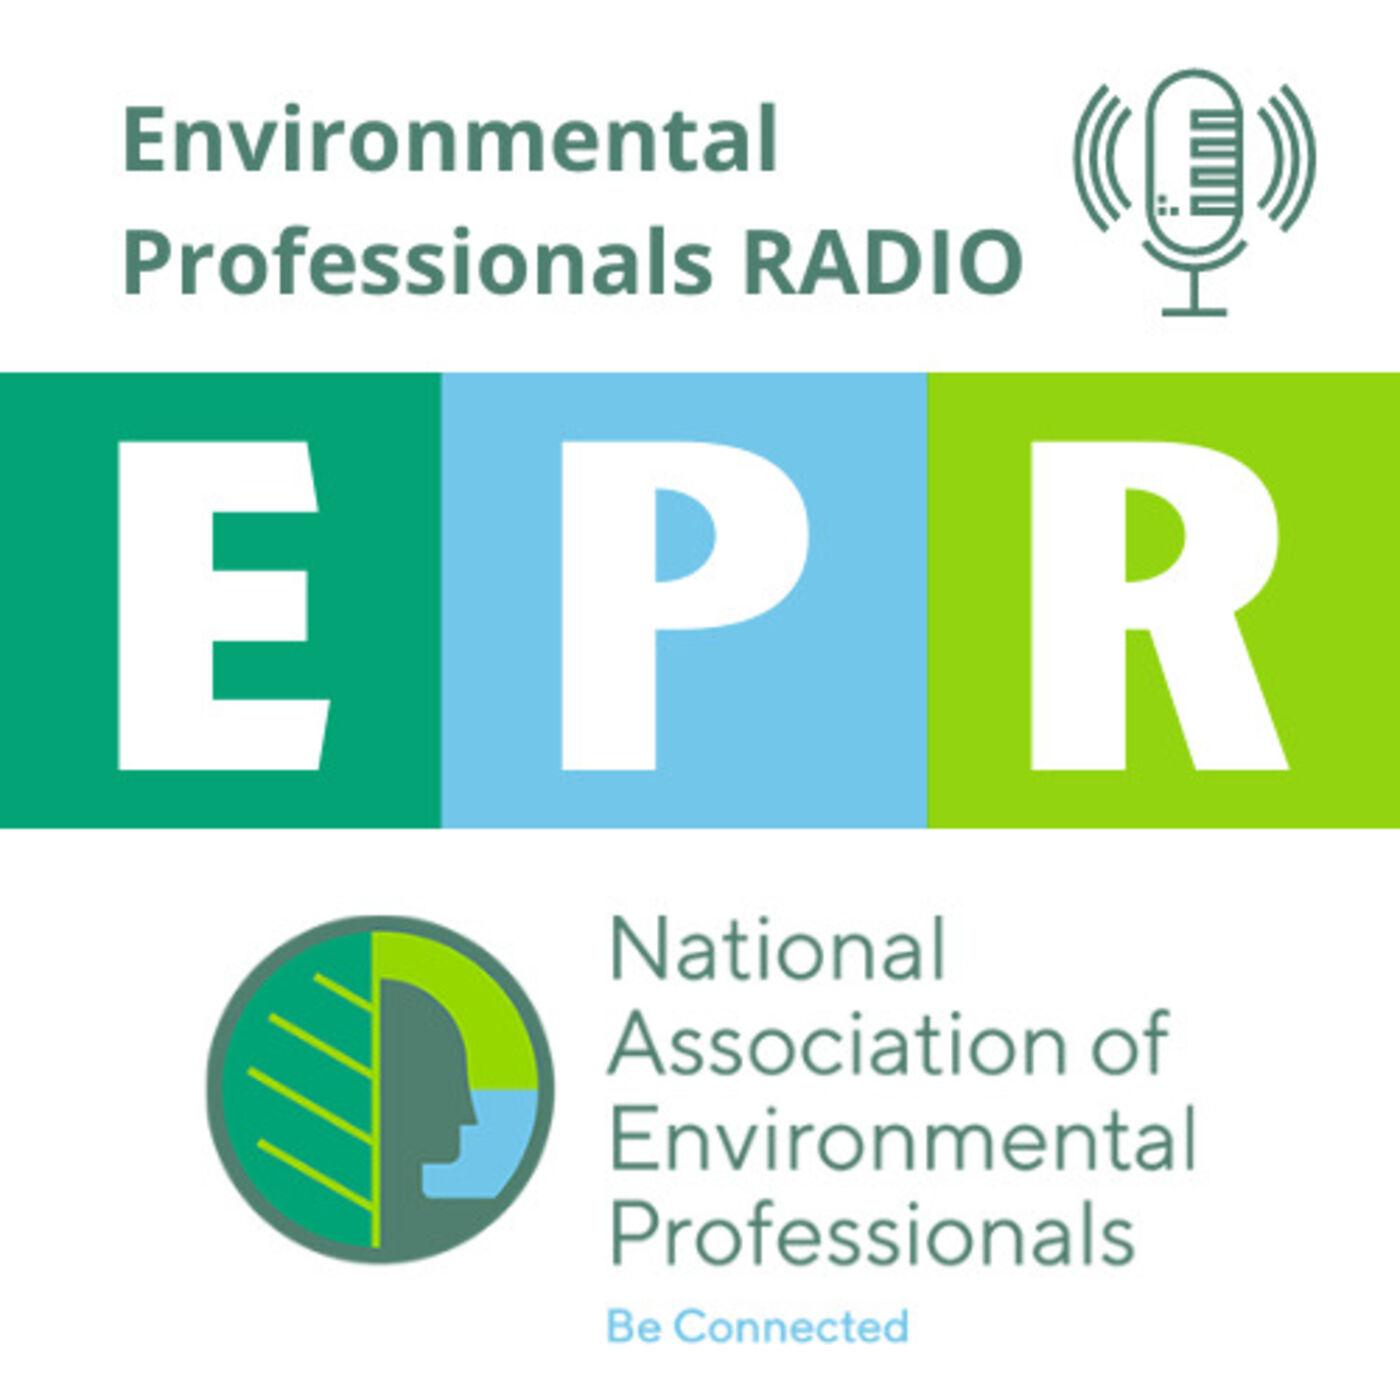 Environmental Professionals Radio (EPR)